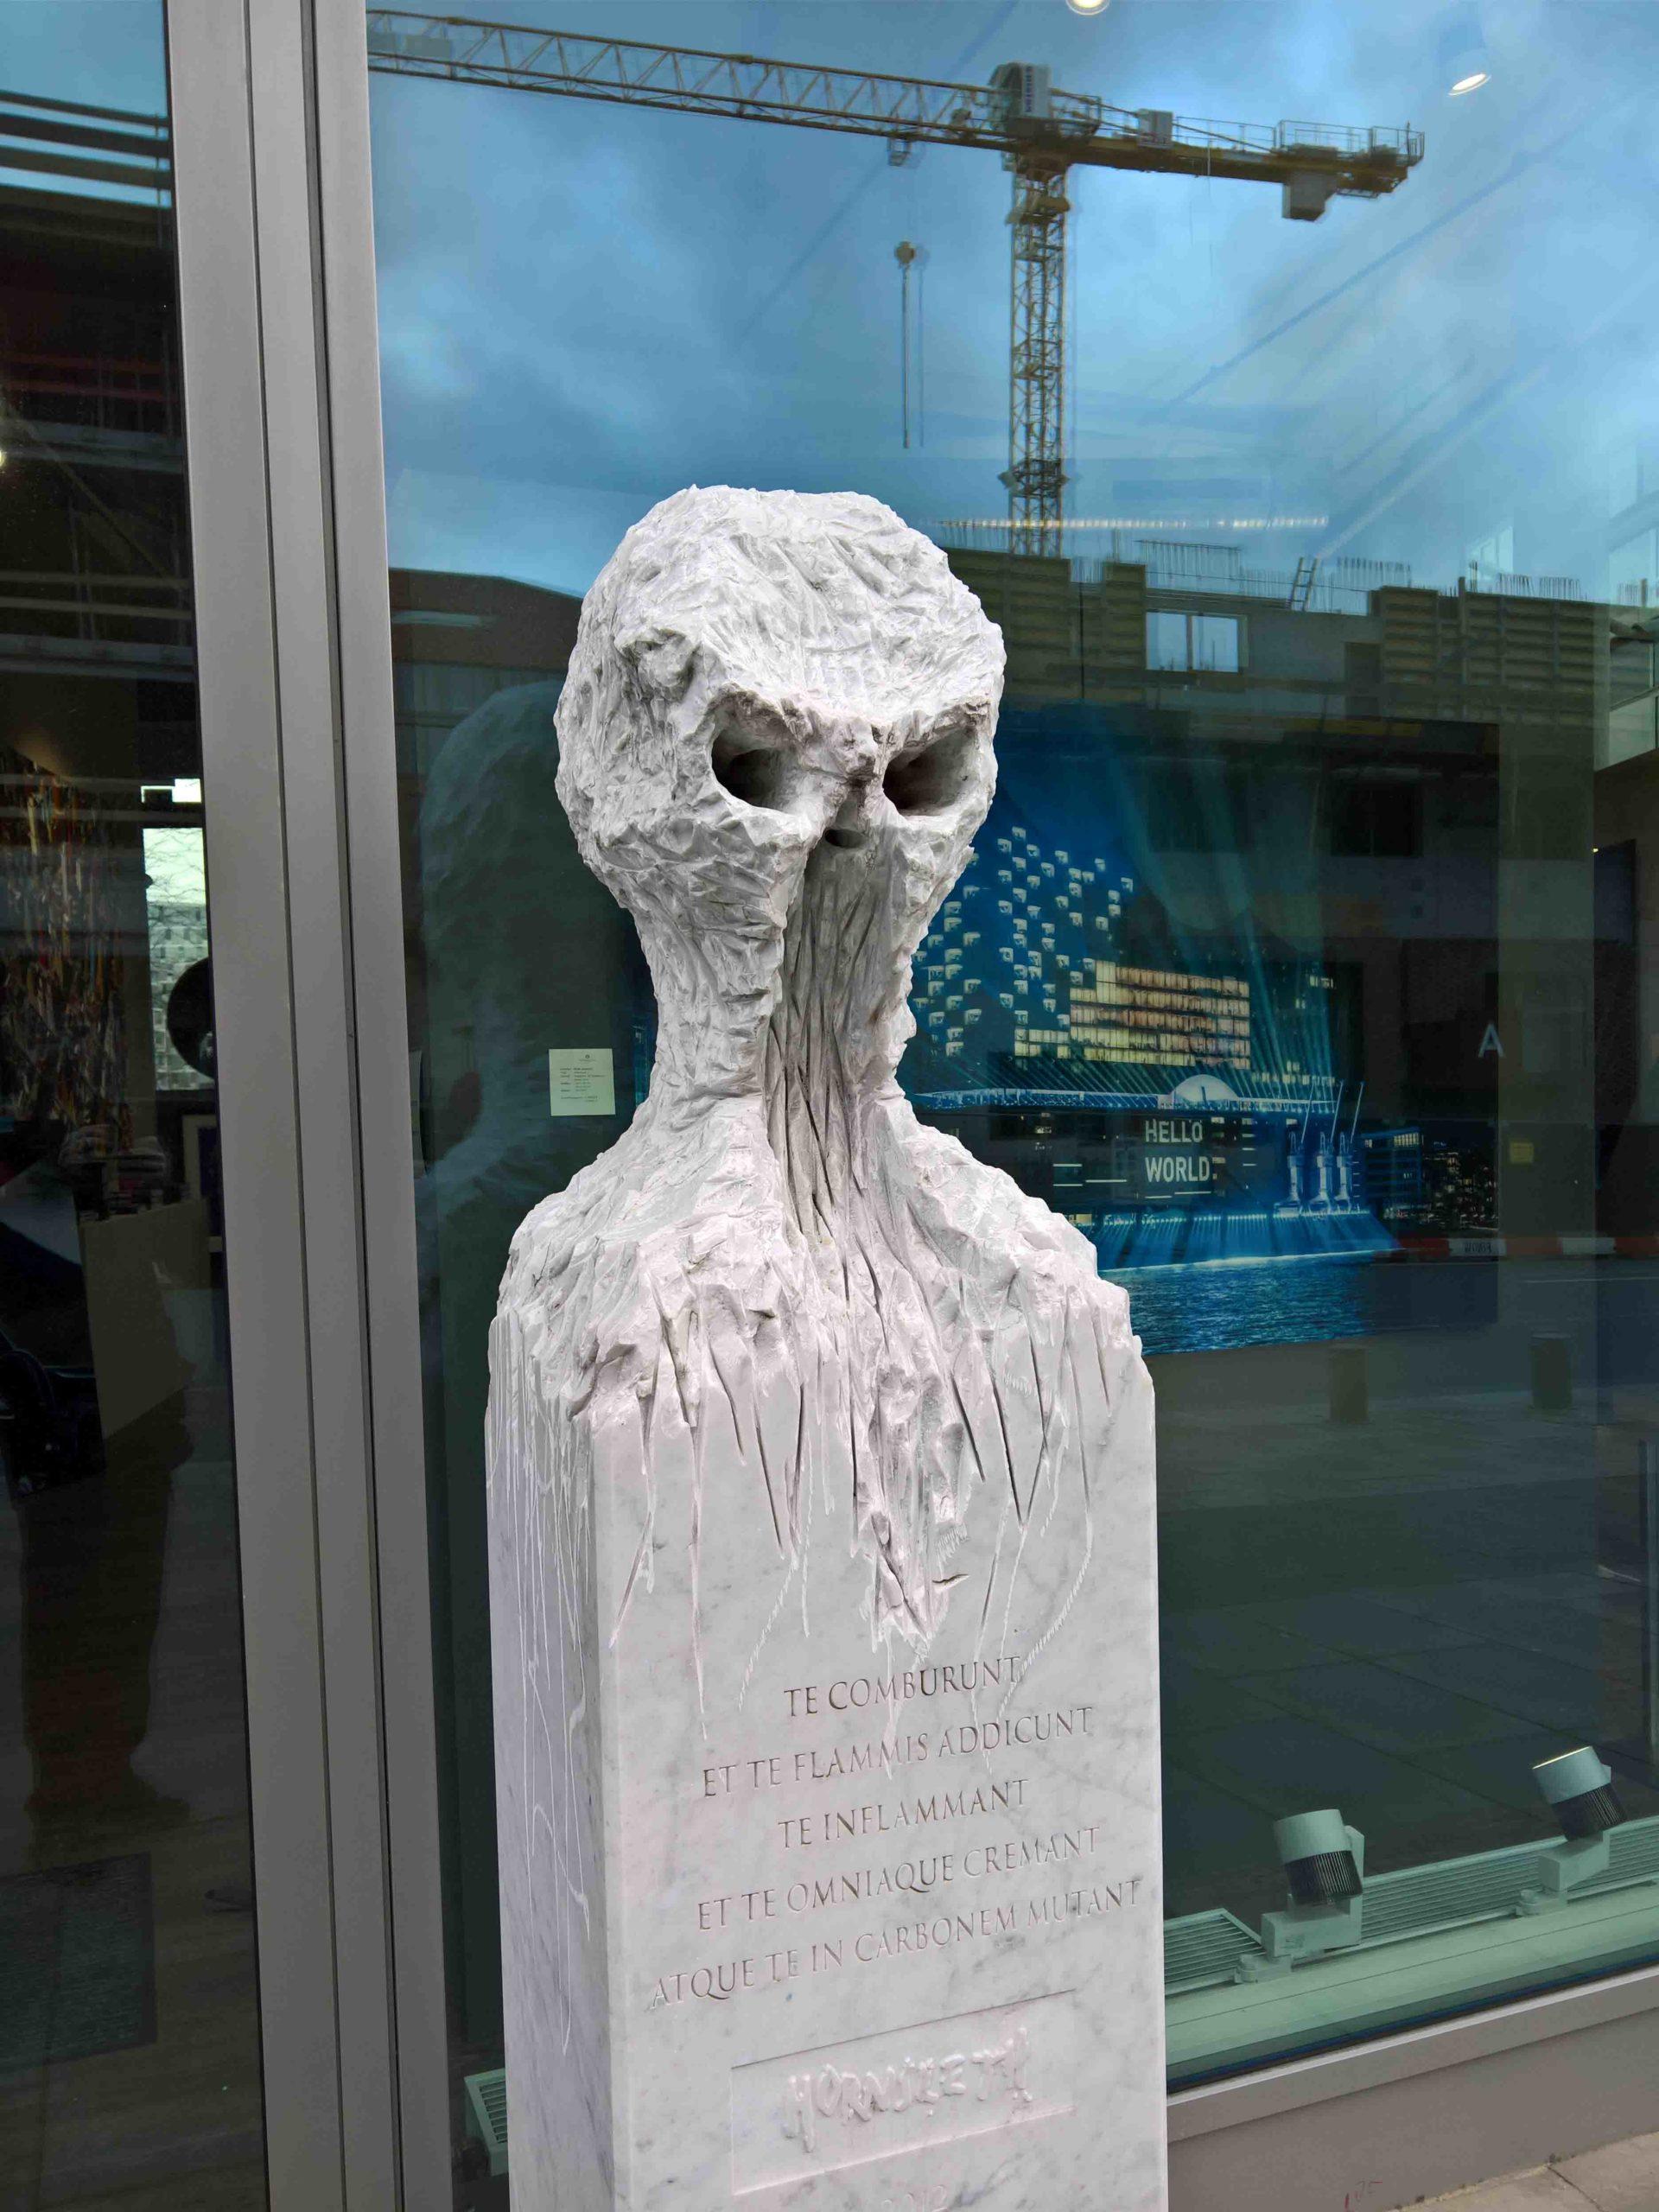 Marble Skull, by the Danish conceptual artist Kristian von Hornsleth